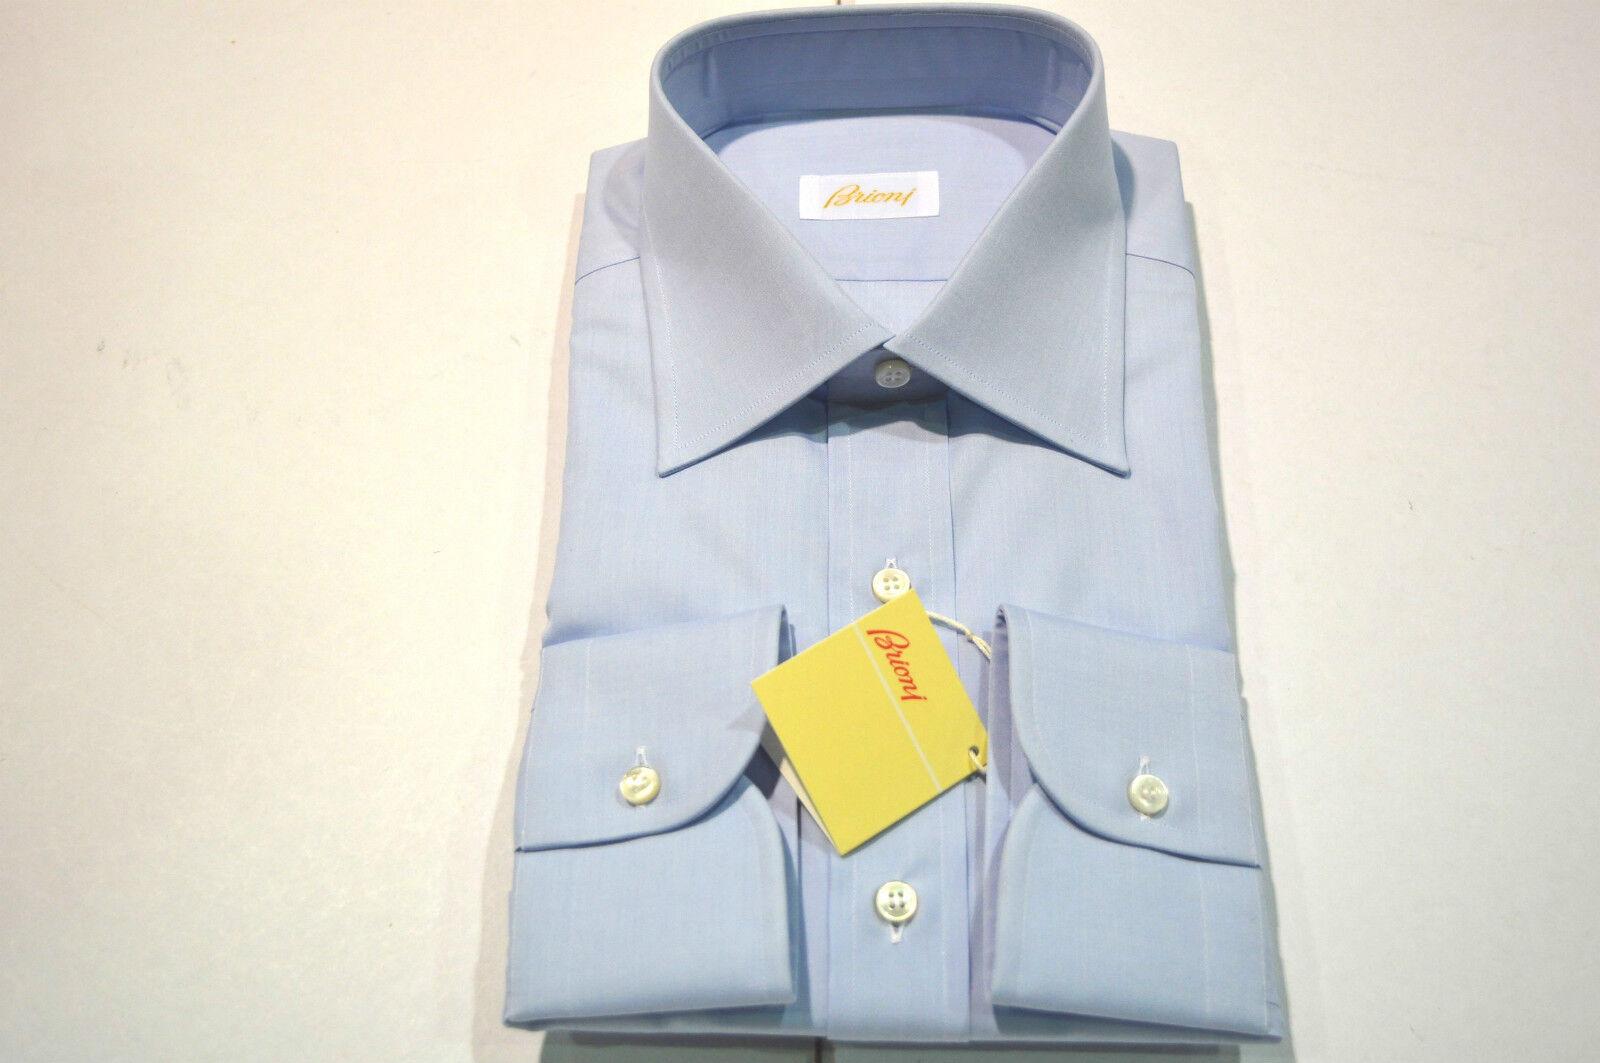 NEW  BRIONI Dress hemd 100% baumwolle Größe 15.5  Us 39  Eu (Cod GE 5)